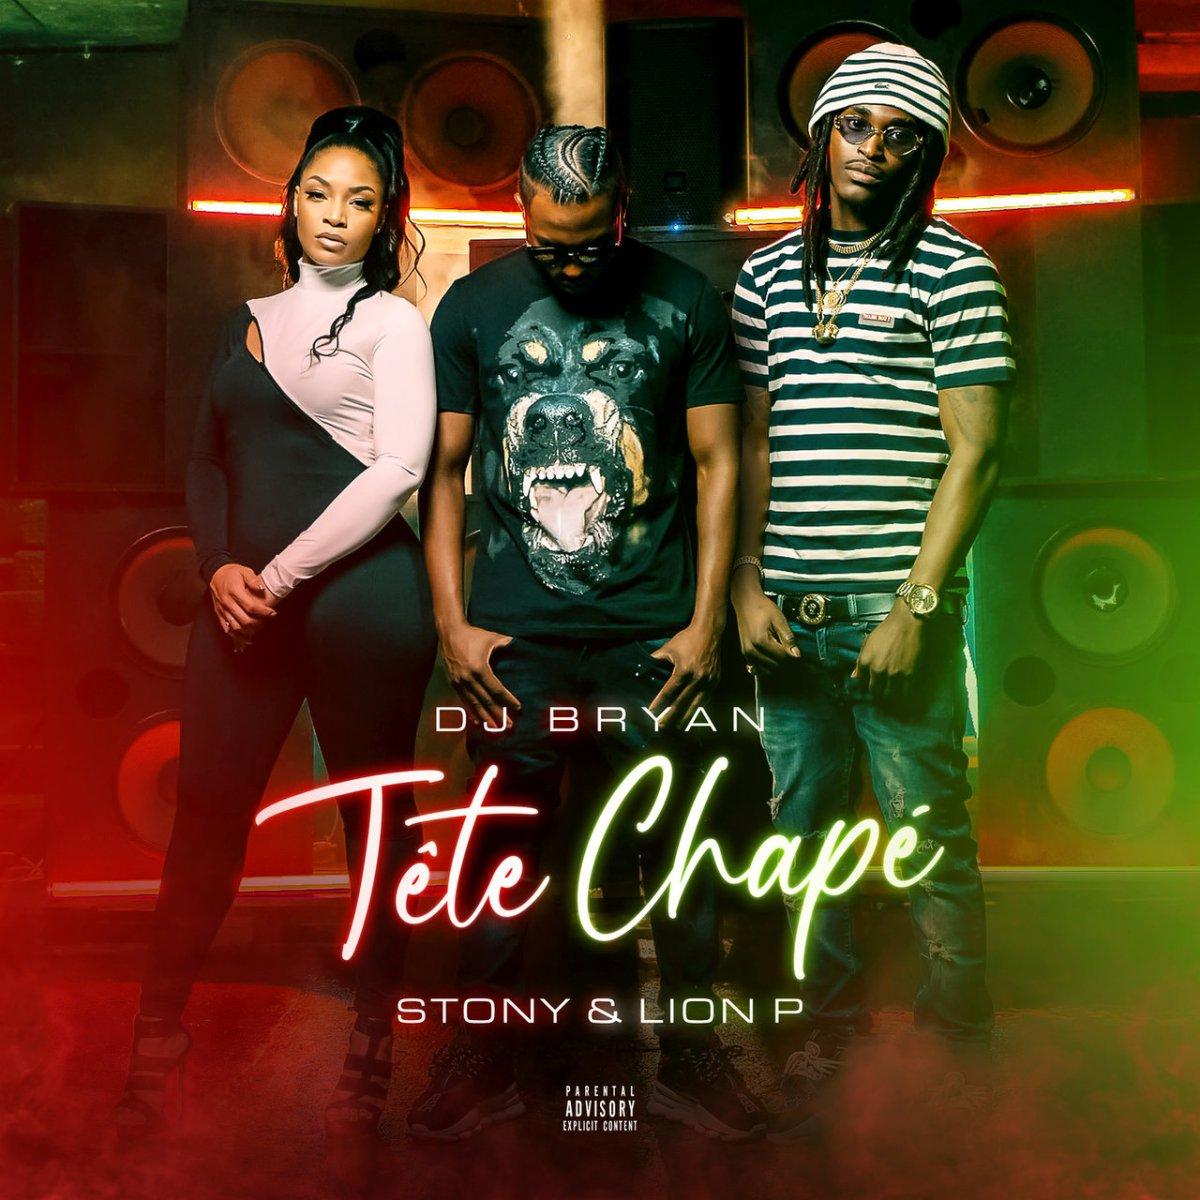 DJ Bryan - Tête Chapé (ft. Stony and Lion P) (Cover)